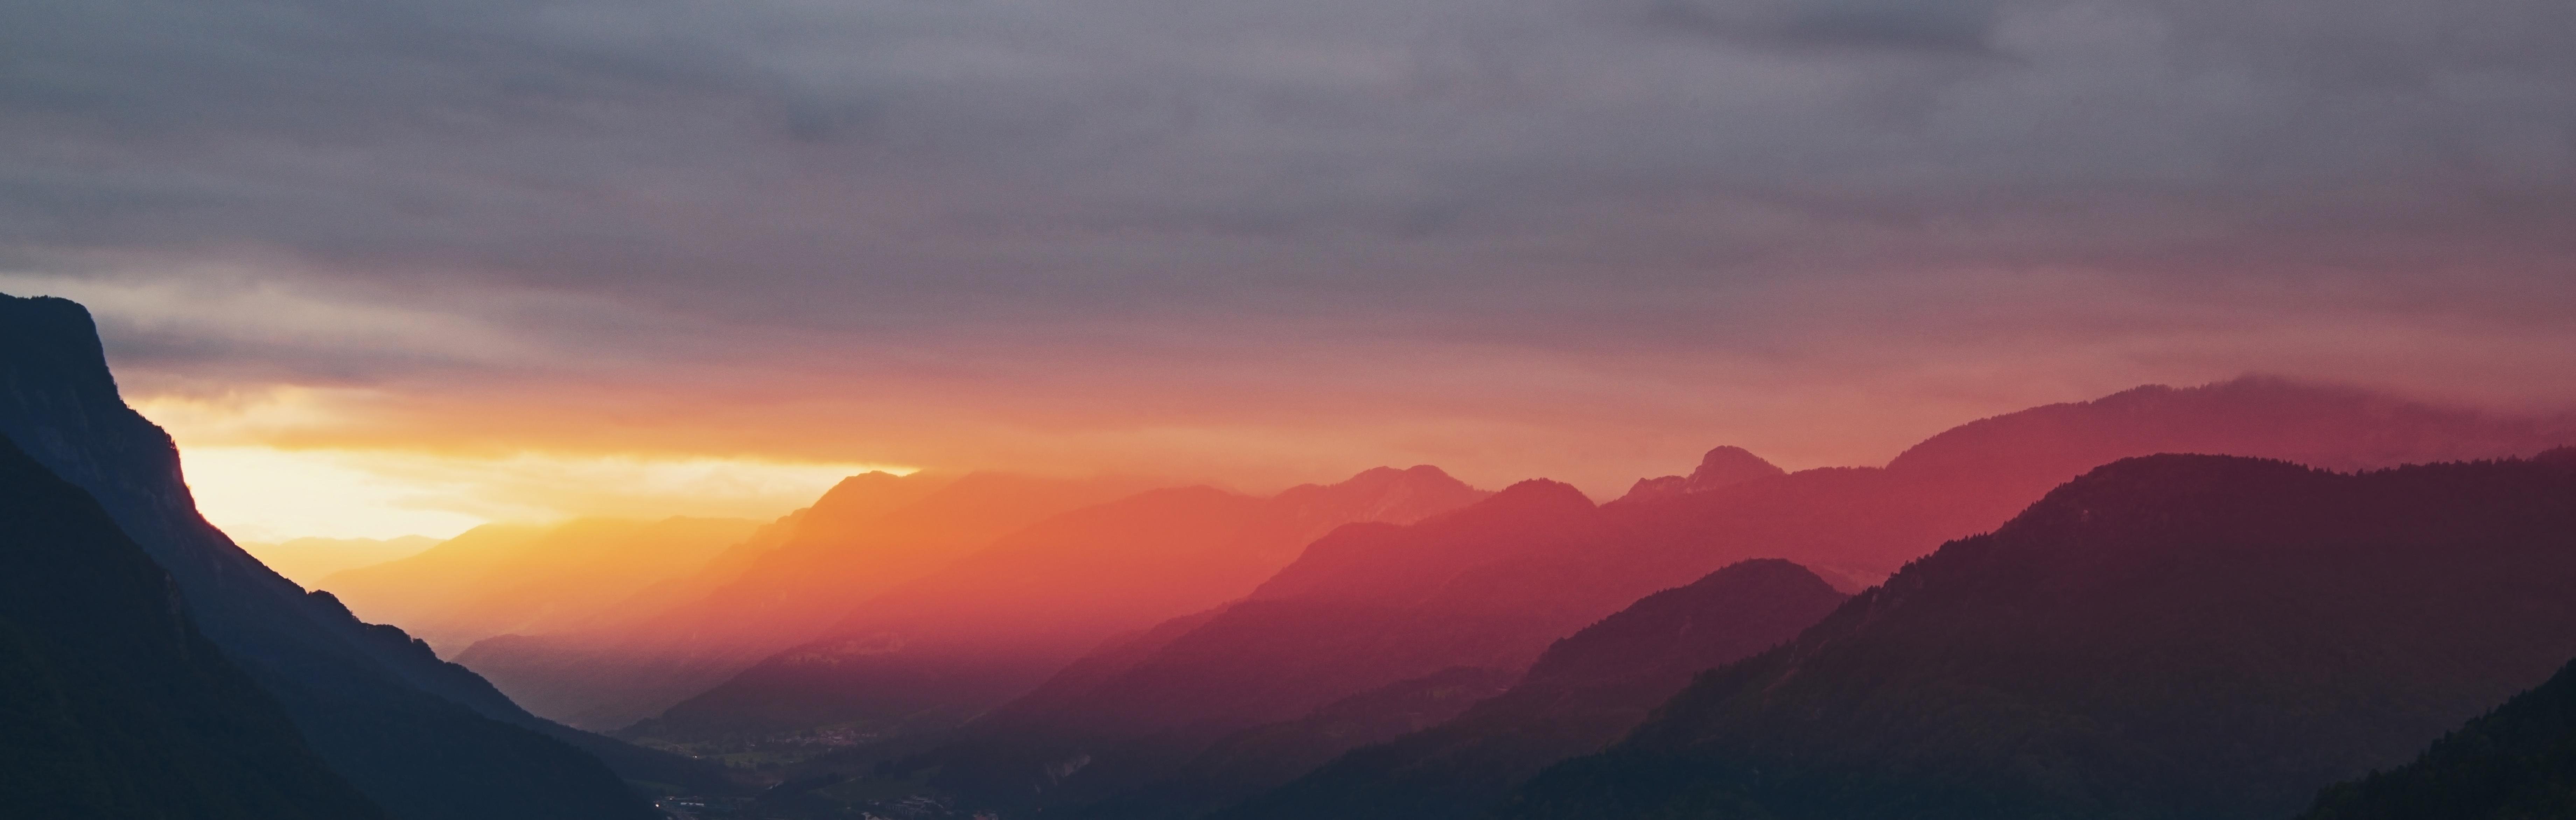 free images cloud sunrise sunset dawn mountain range